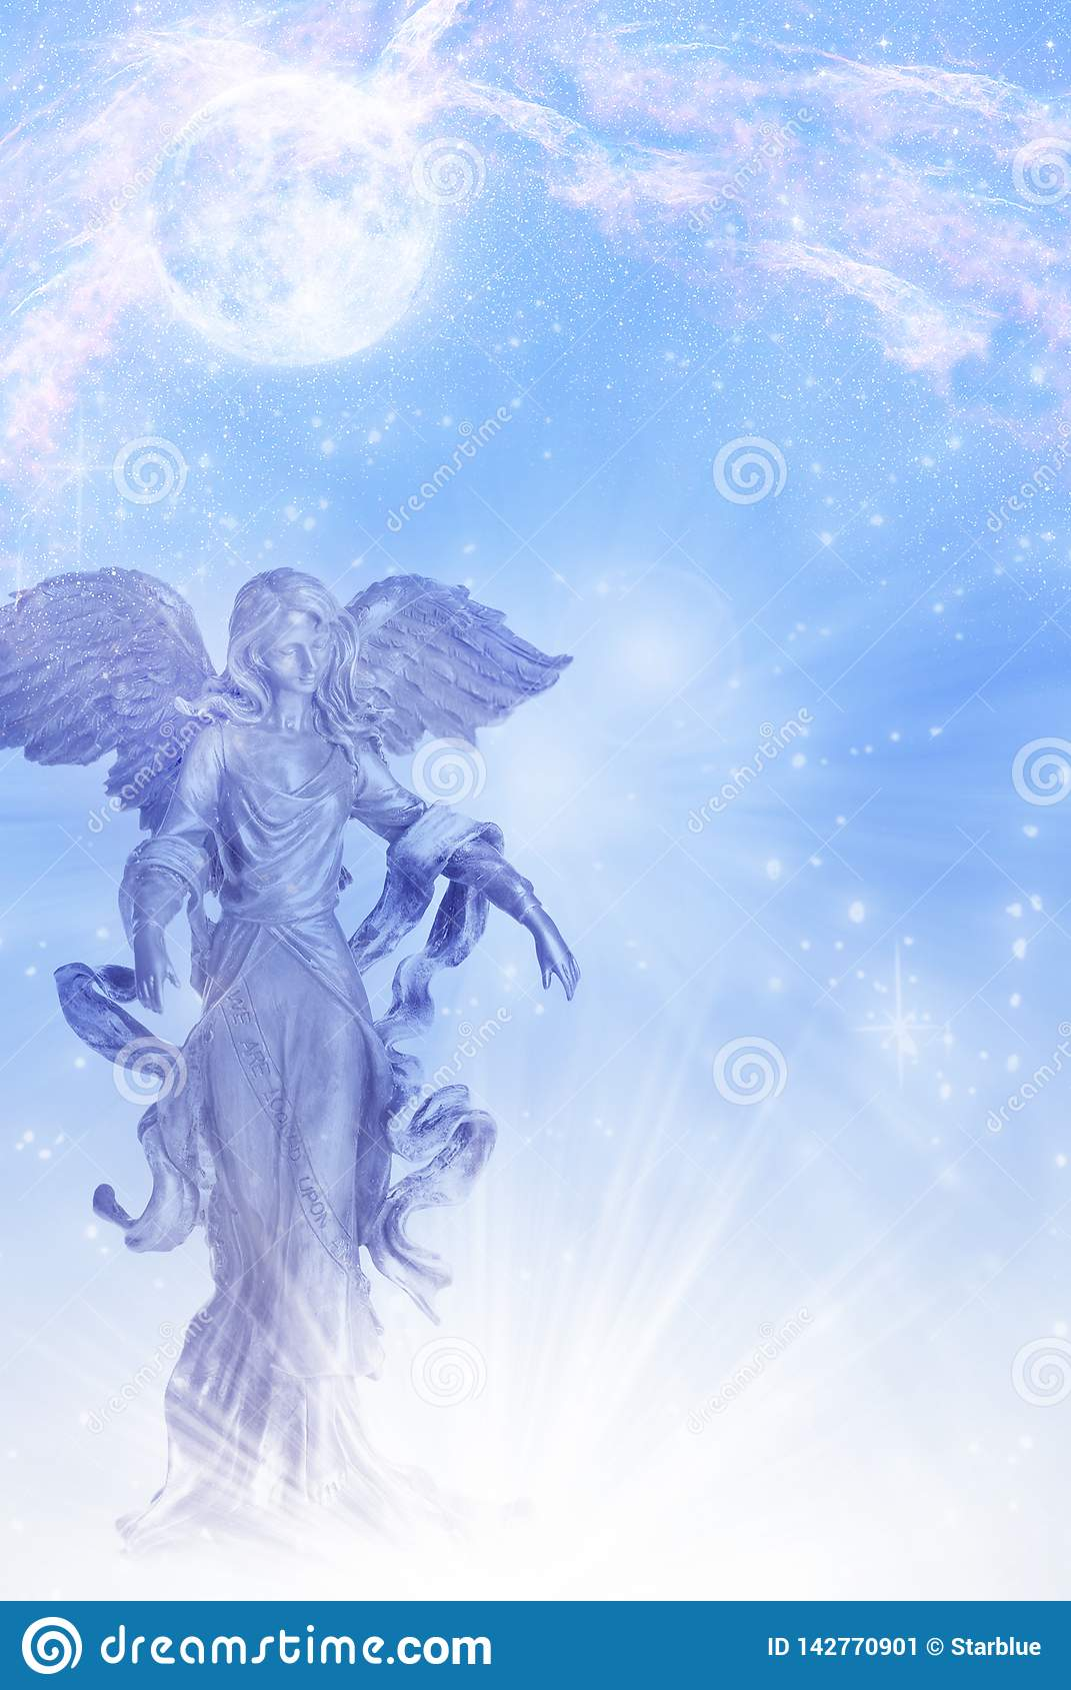 Angel archangel of Moon Luna with stars over blue backround